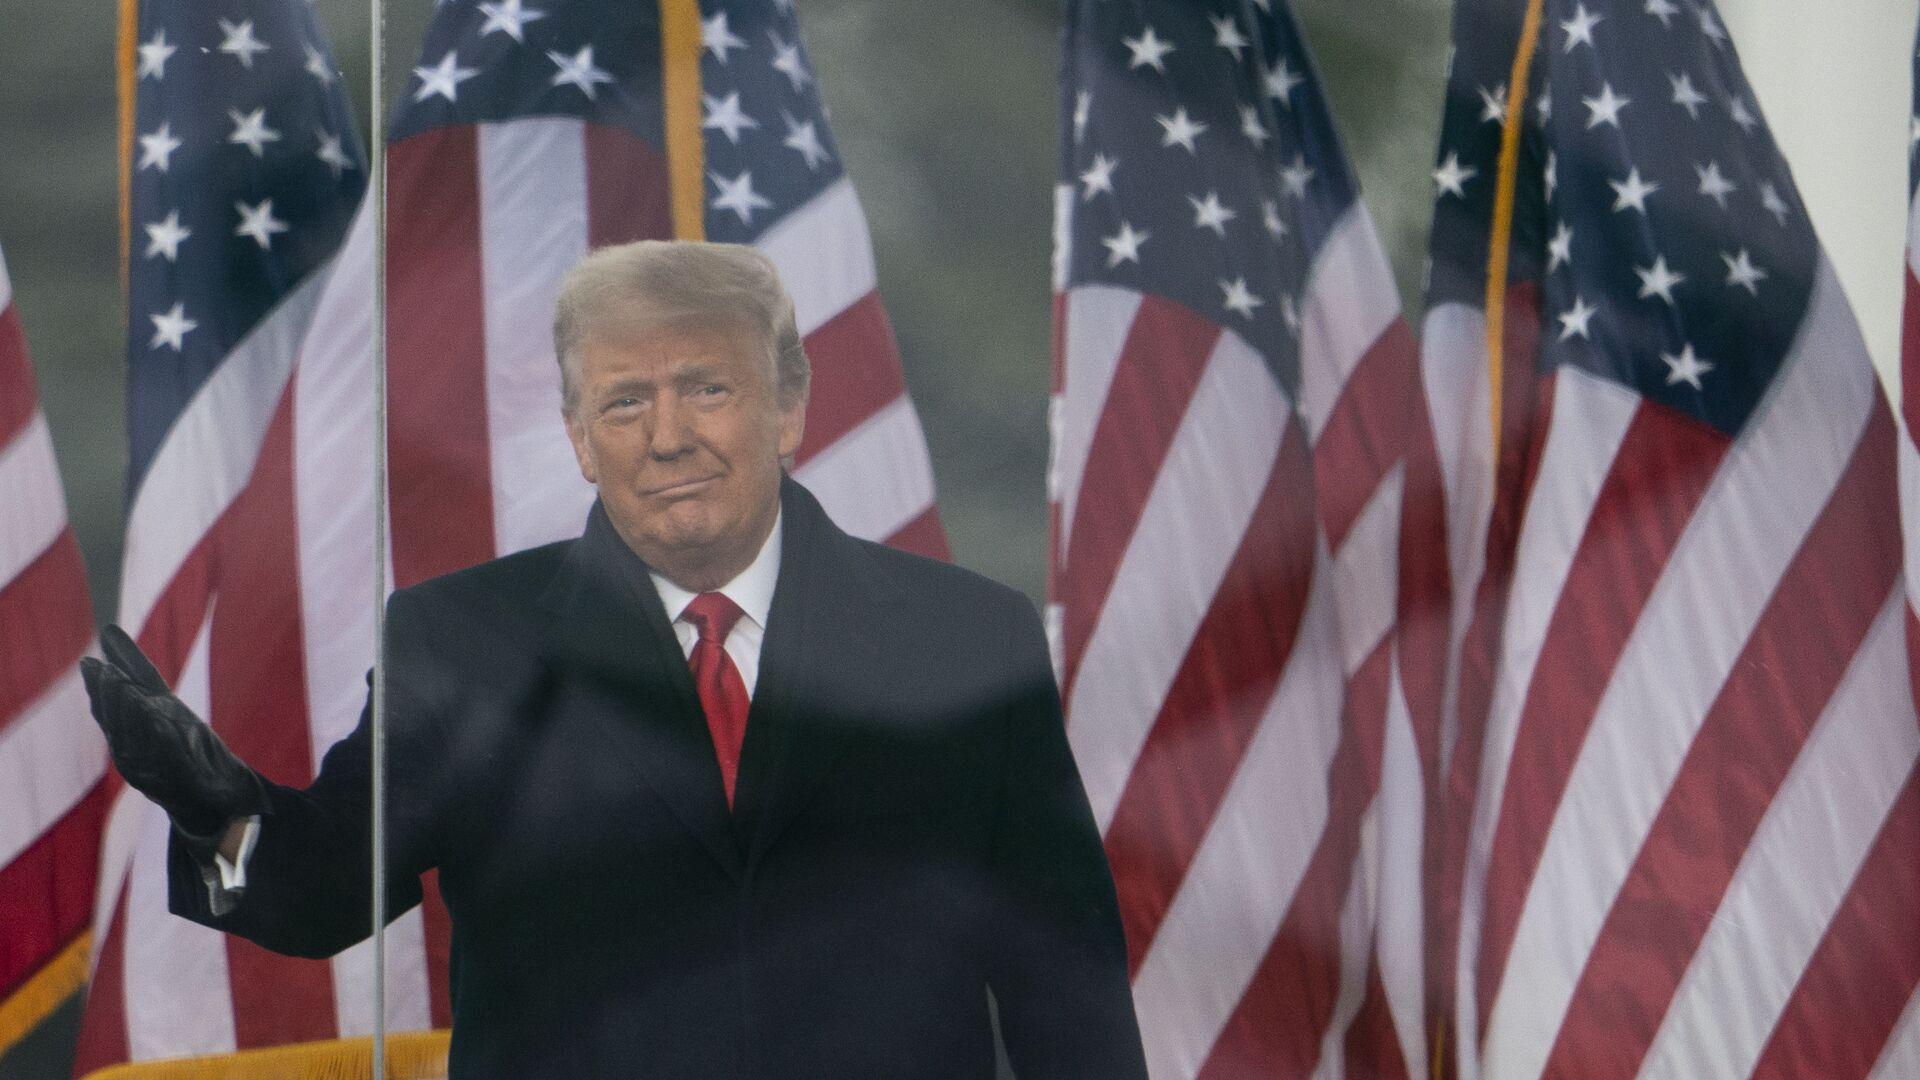 Il presidente Donald Trump - Sputnik Italia, 1920, 23.03.2021